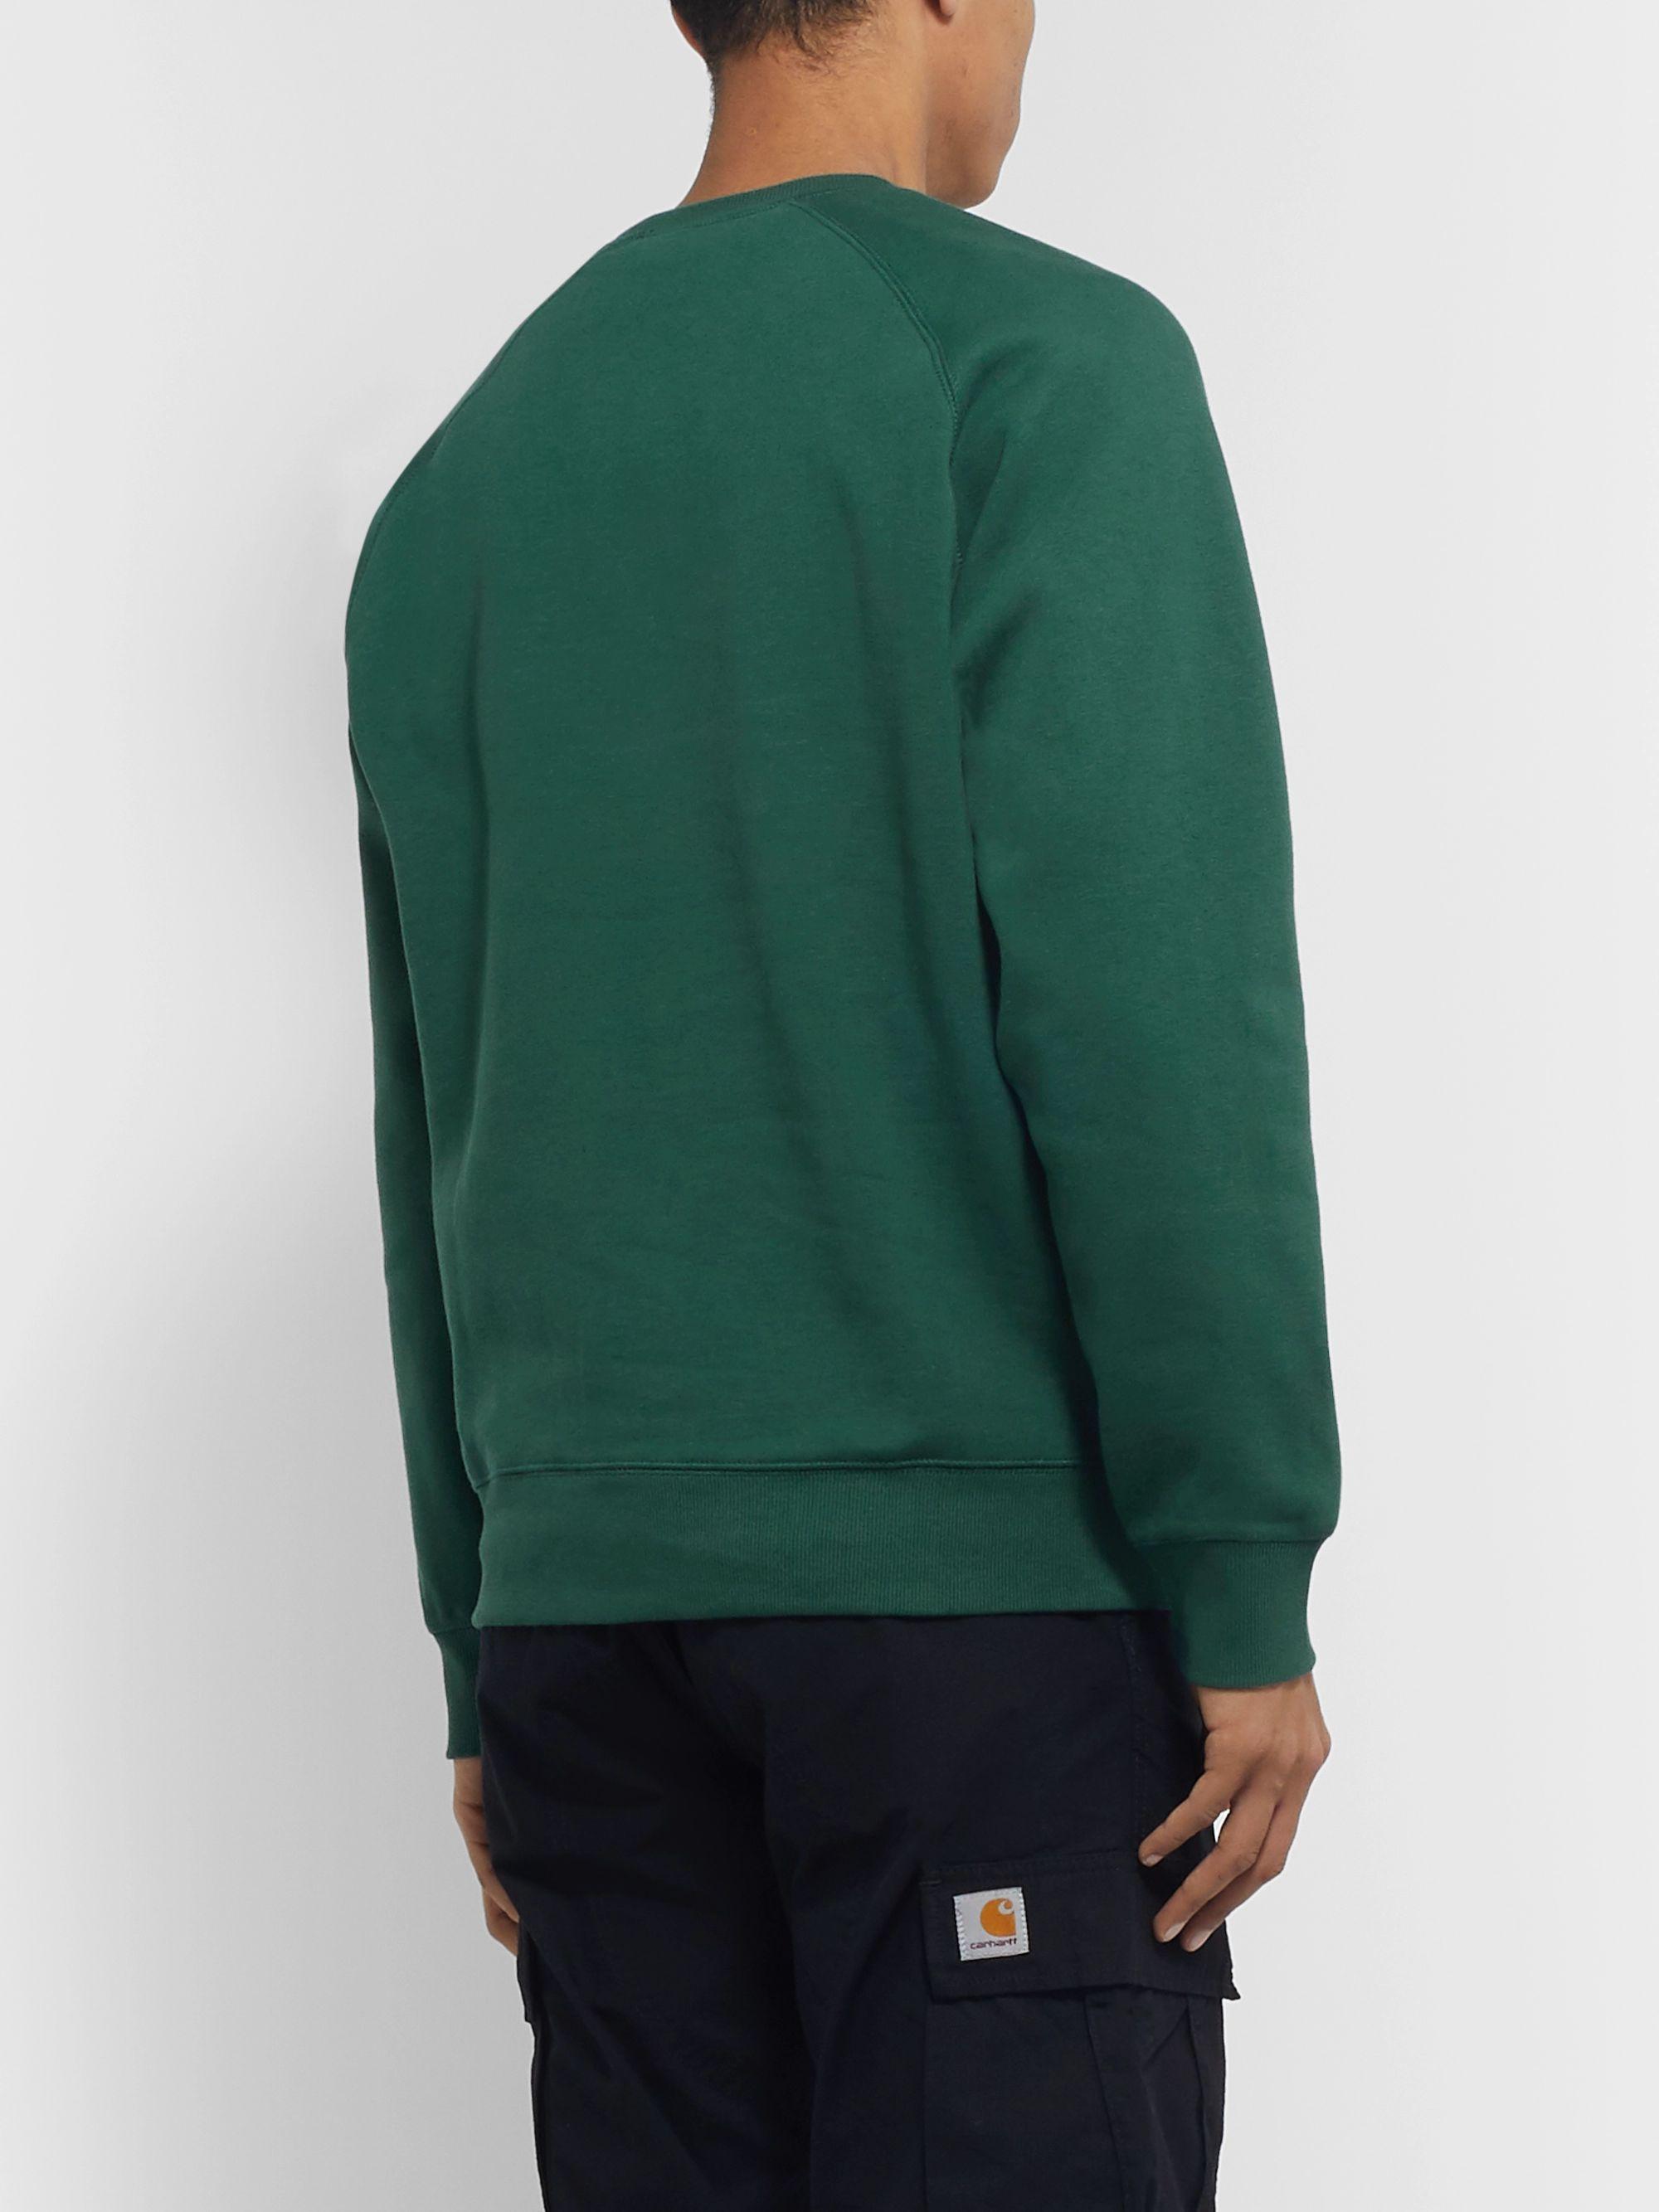 Chase Logo Embroidered Fleece Back Cotton Jersey Sweatshirt